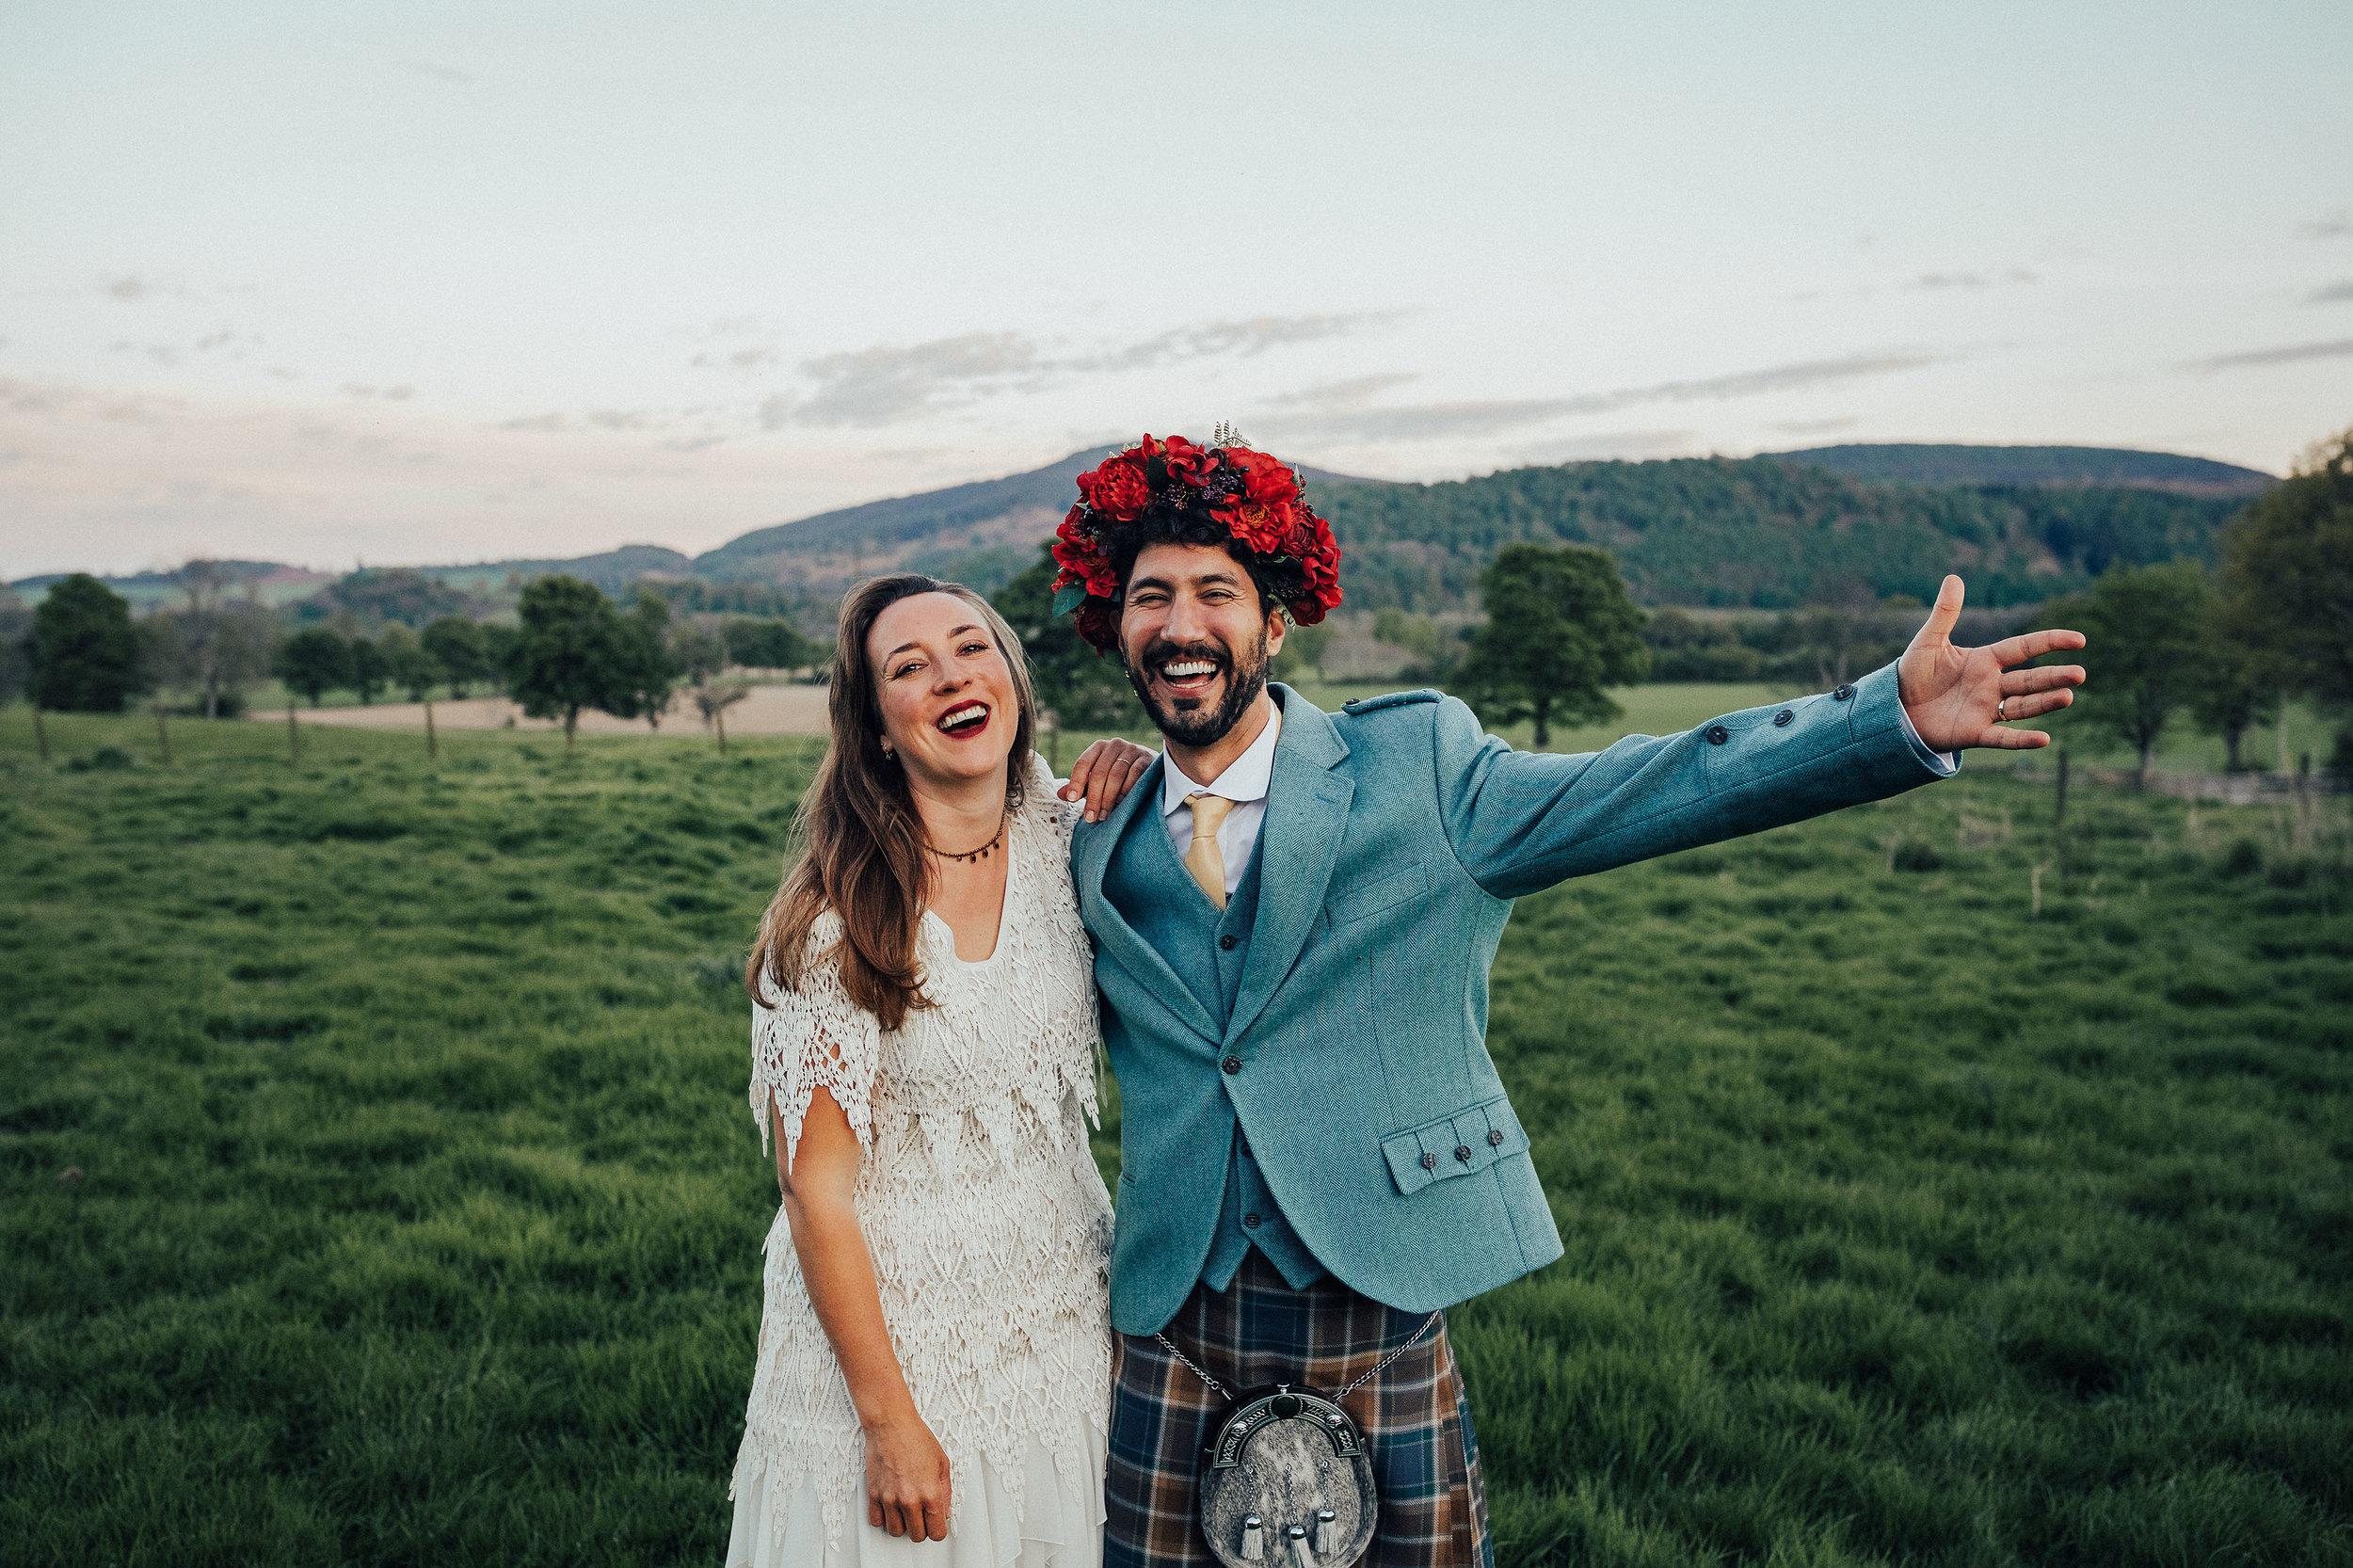 COMRIE_CROFT_WEDDINGS_PJ_PHILLIPS_PHOTOGRAPHY_189.jpg